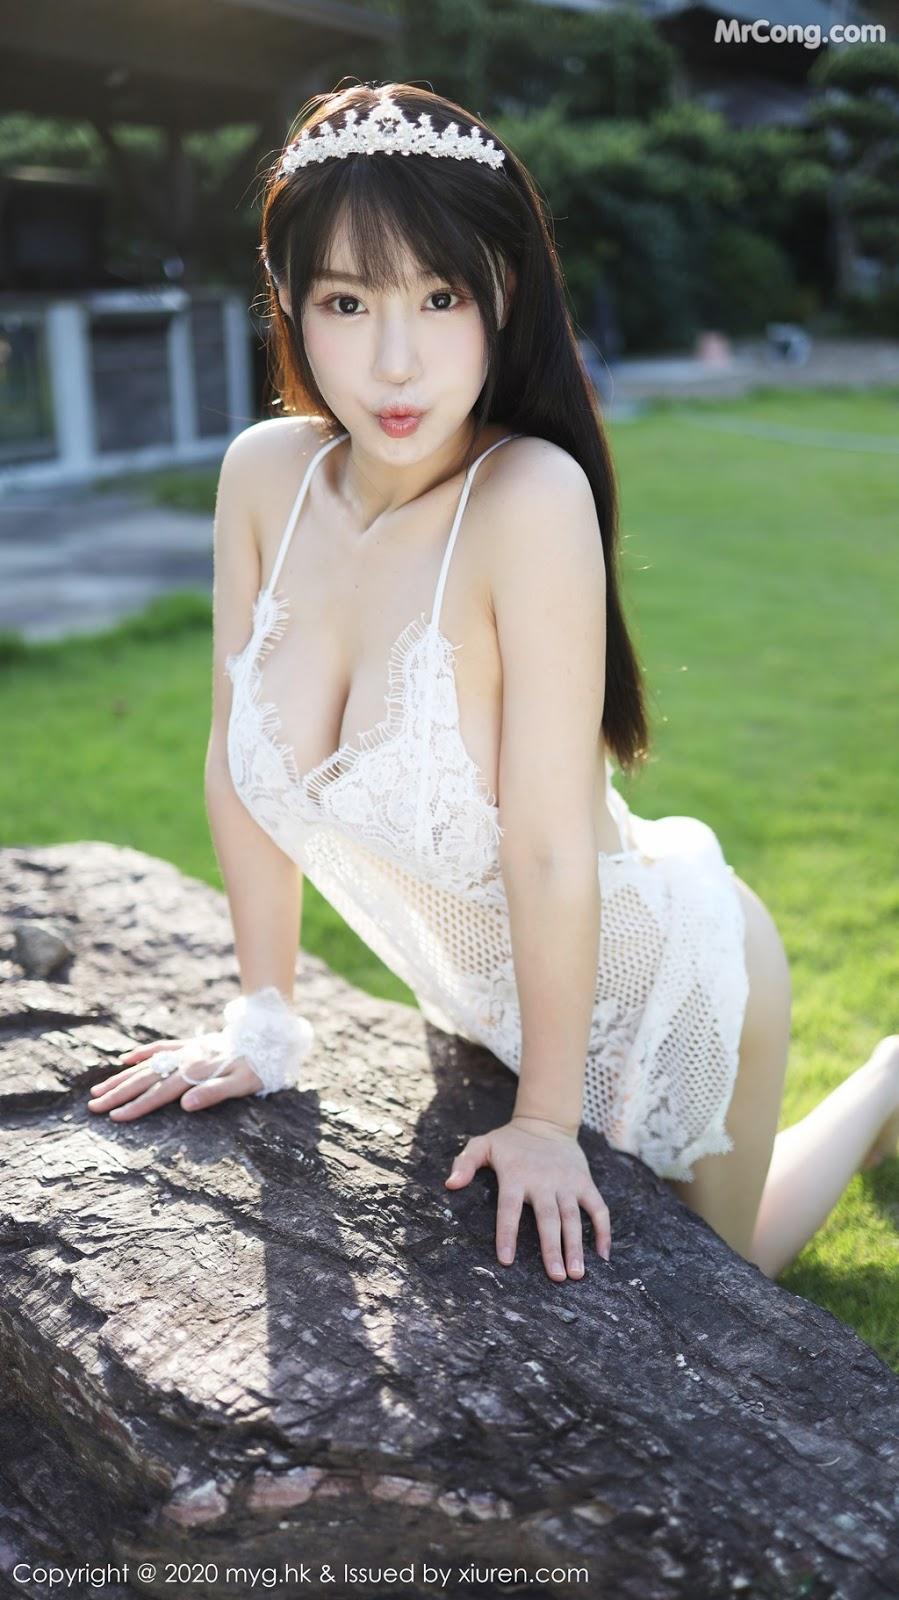 MyGirl Vol.423: Zhu Ke Er (朱 可 儿 Flower) (41 pictures)